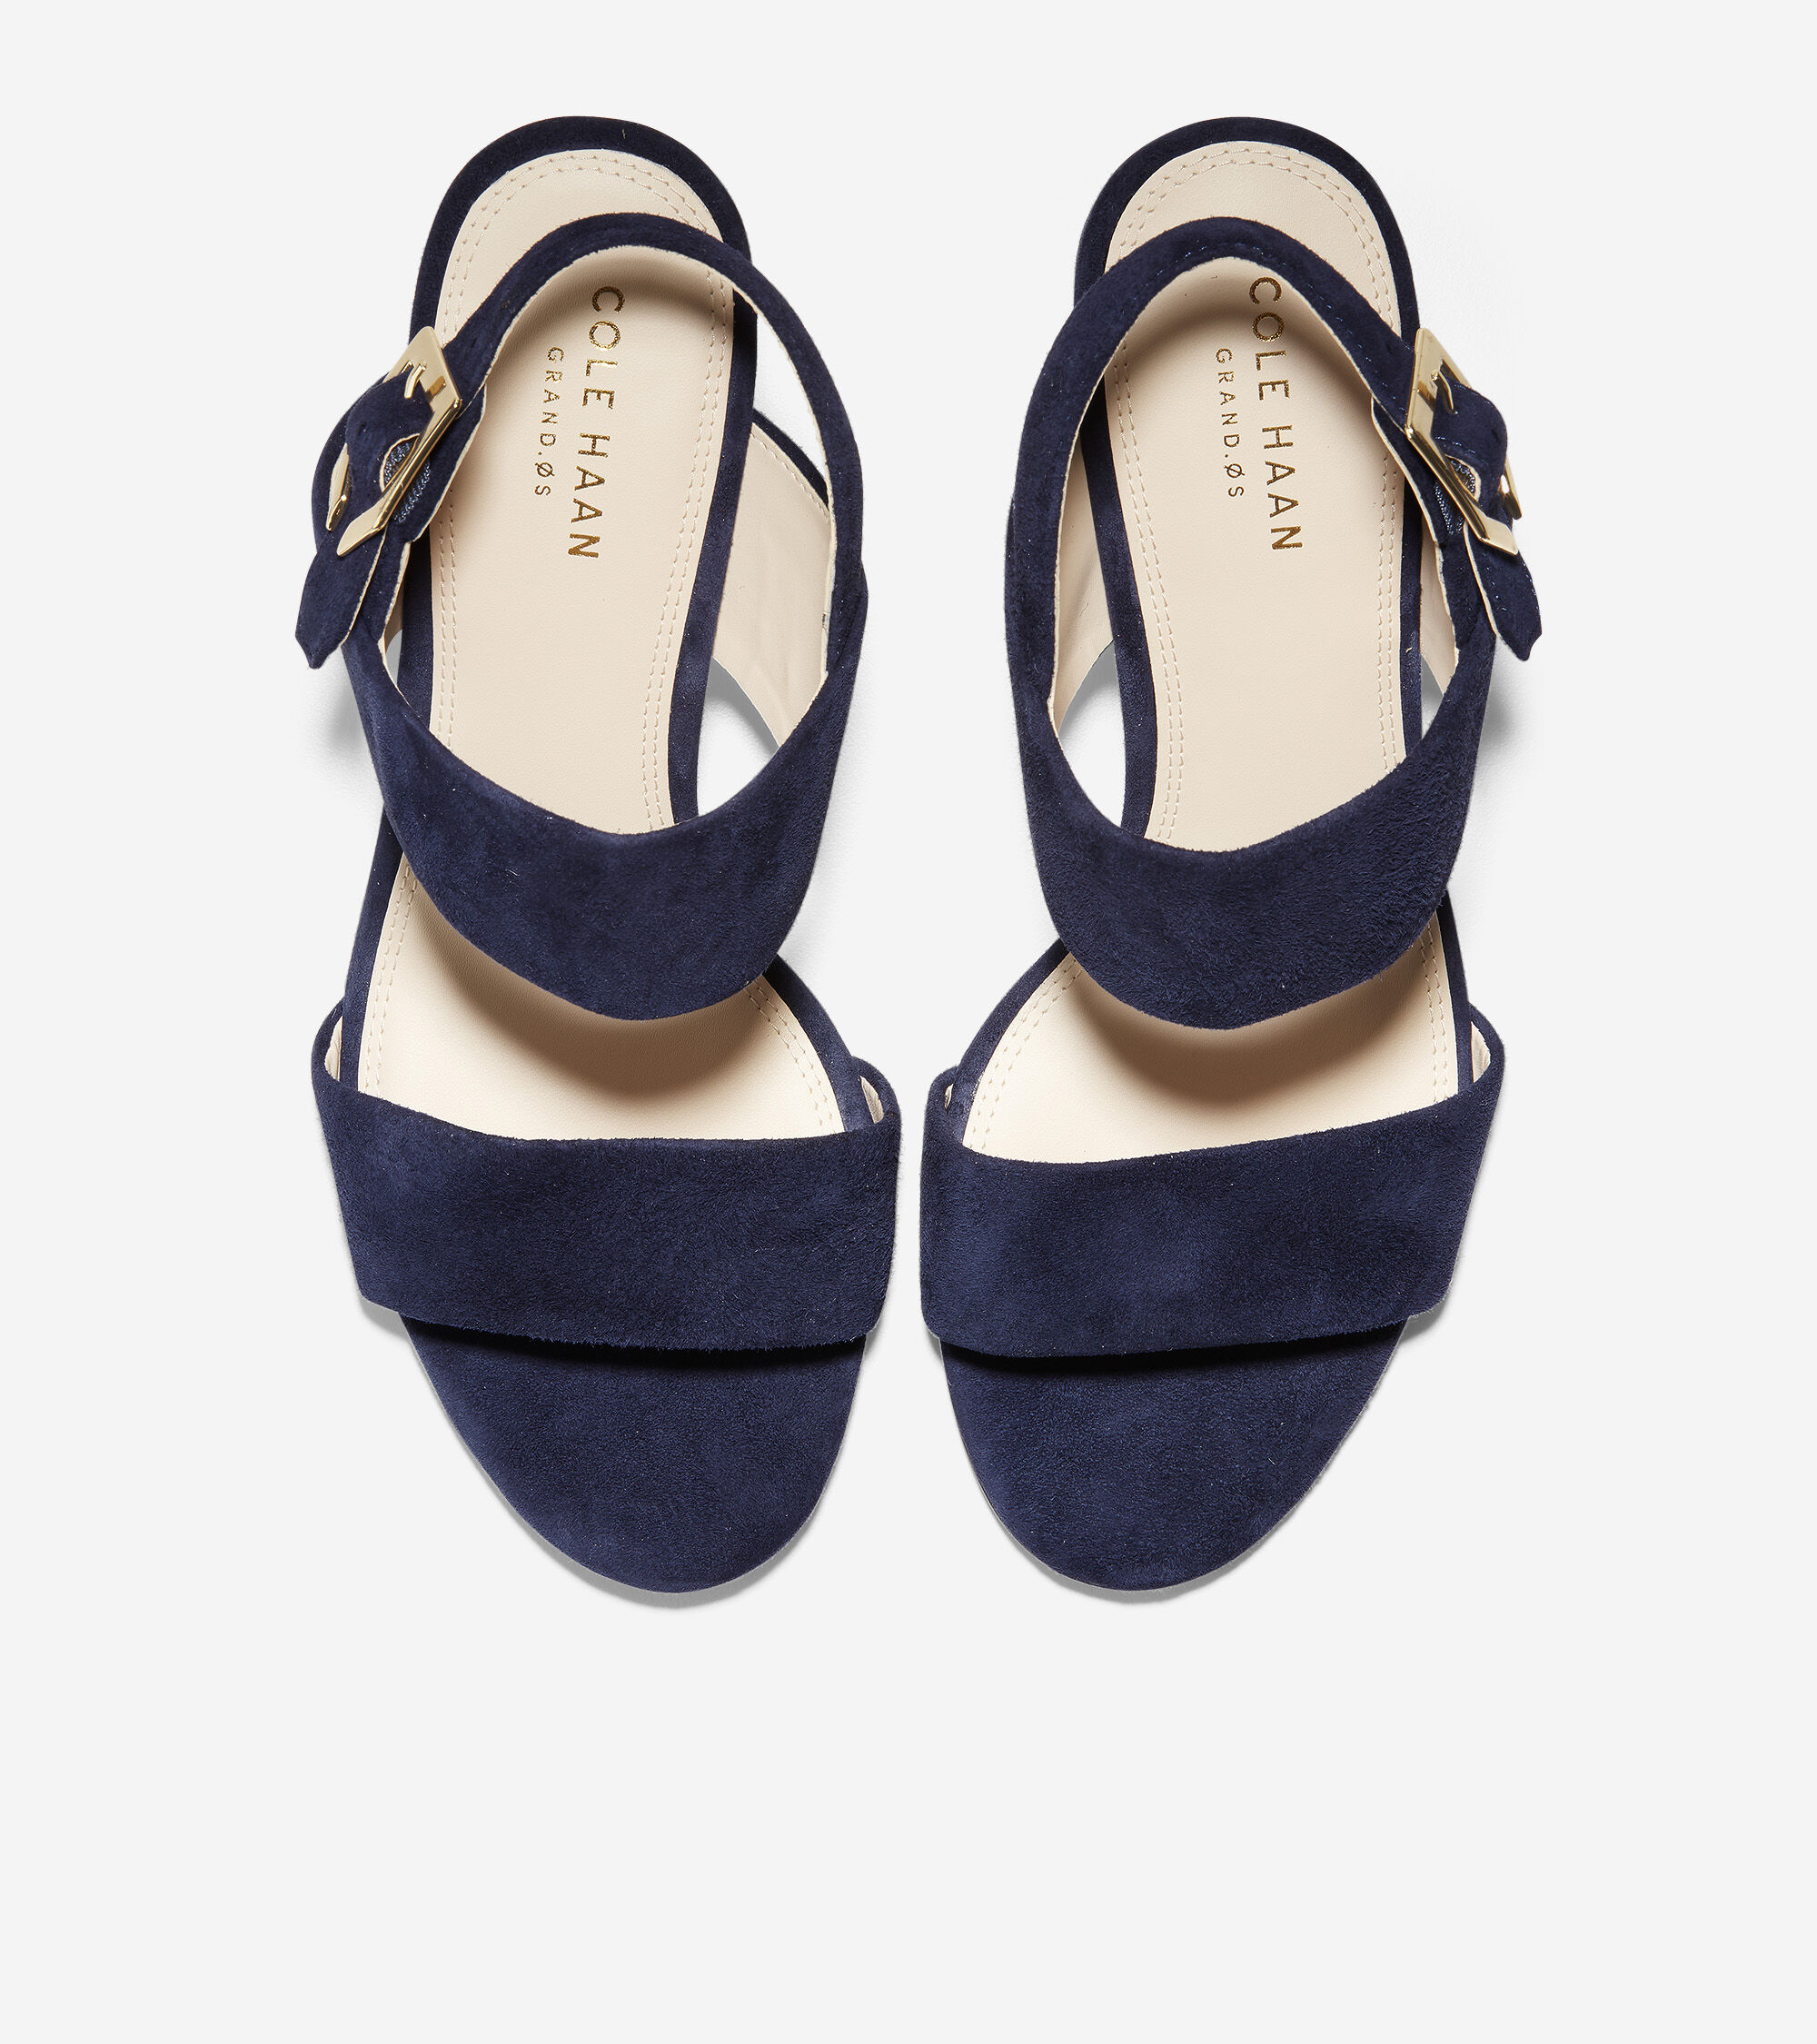 87999312cd Women s Avani City Sandals 65mm in Marine Blue